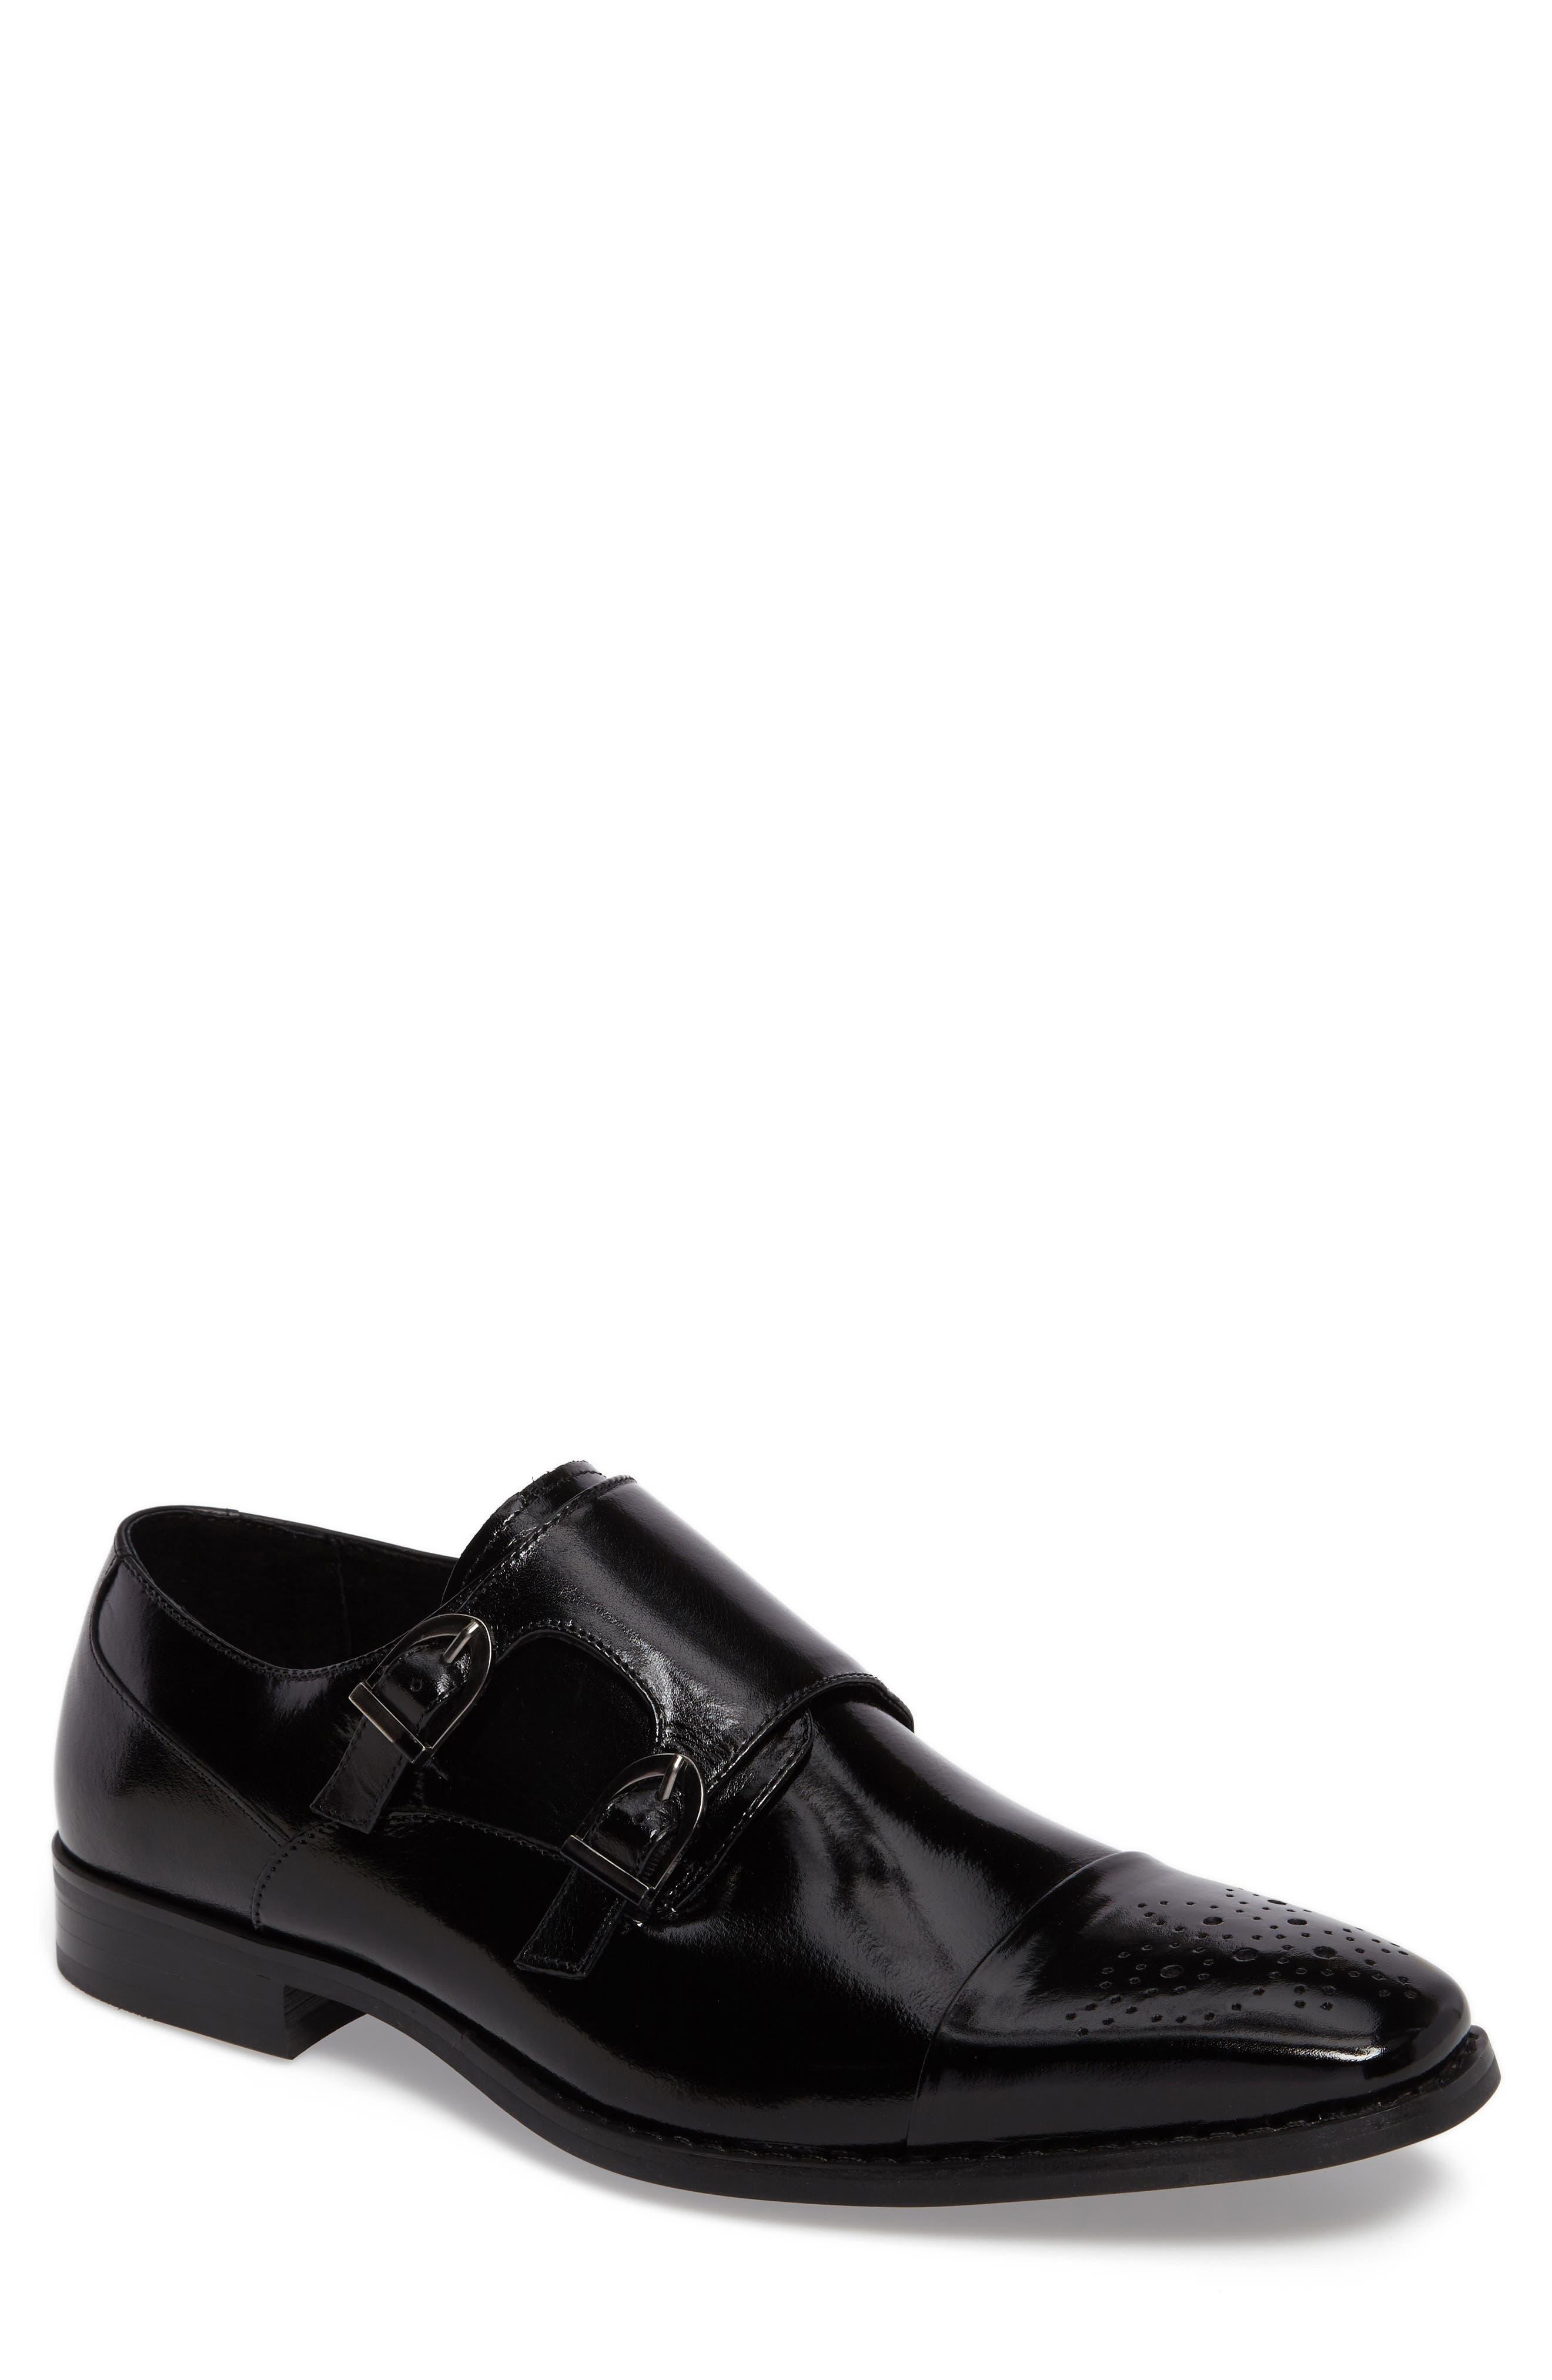 Alternate Image 1 Selected - Stacy Adams Trevor Double Monk Strap Shoe (Men)